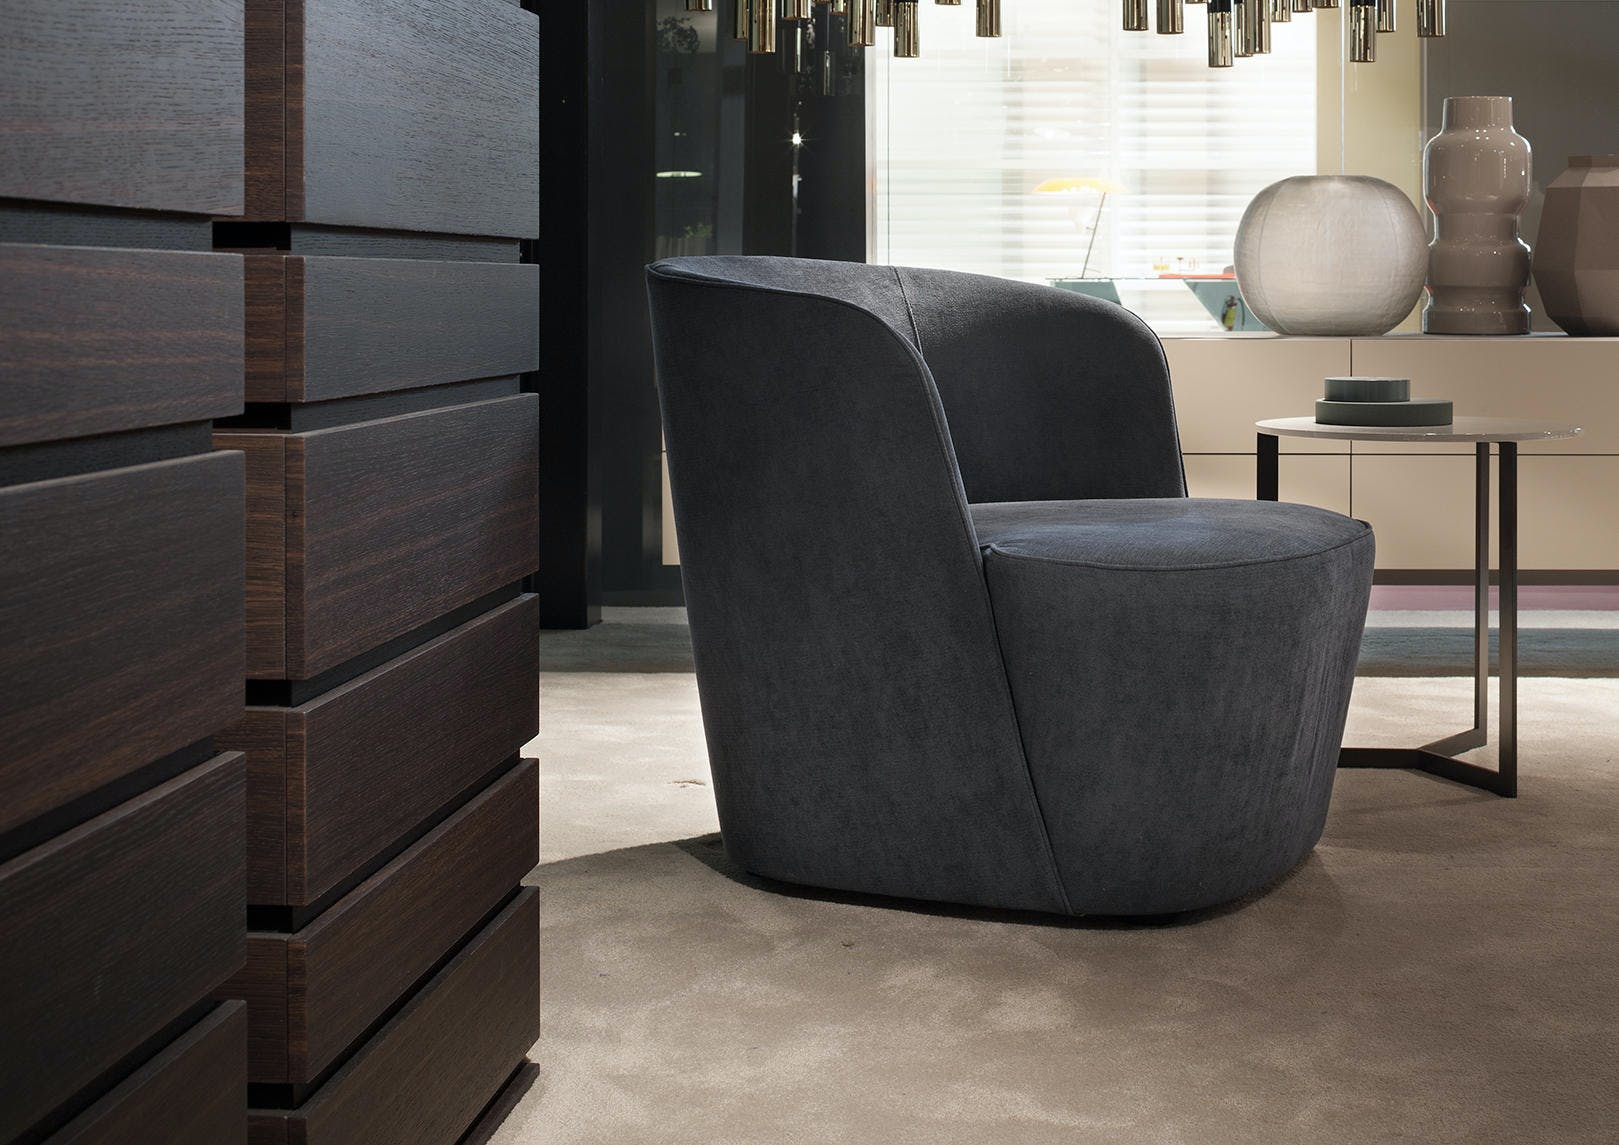 Lema-furniture-felix-armchair-side-insitu-haute-living